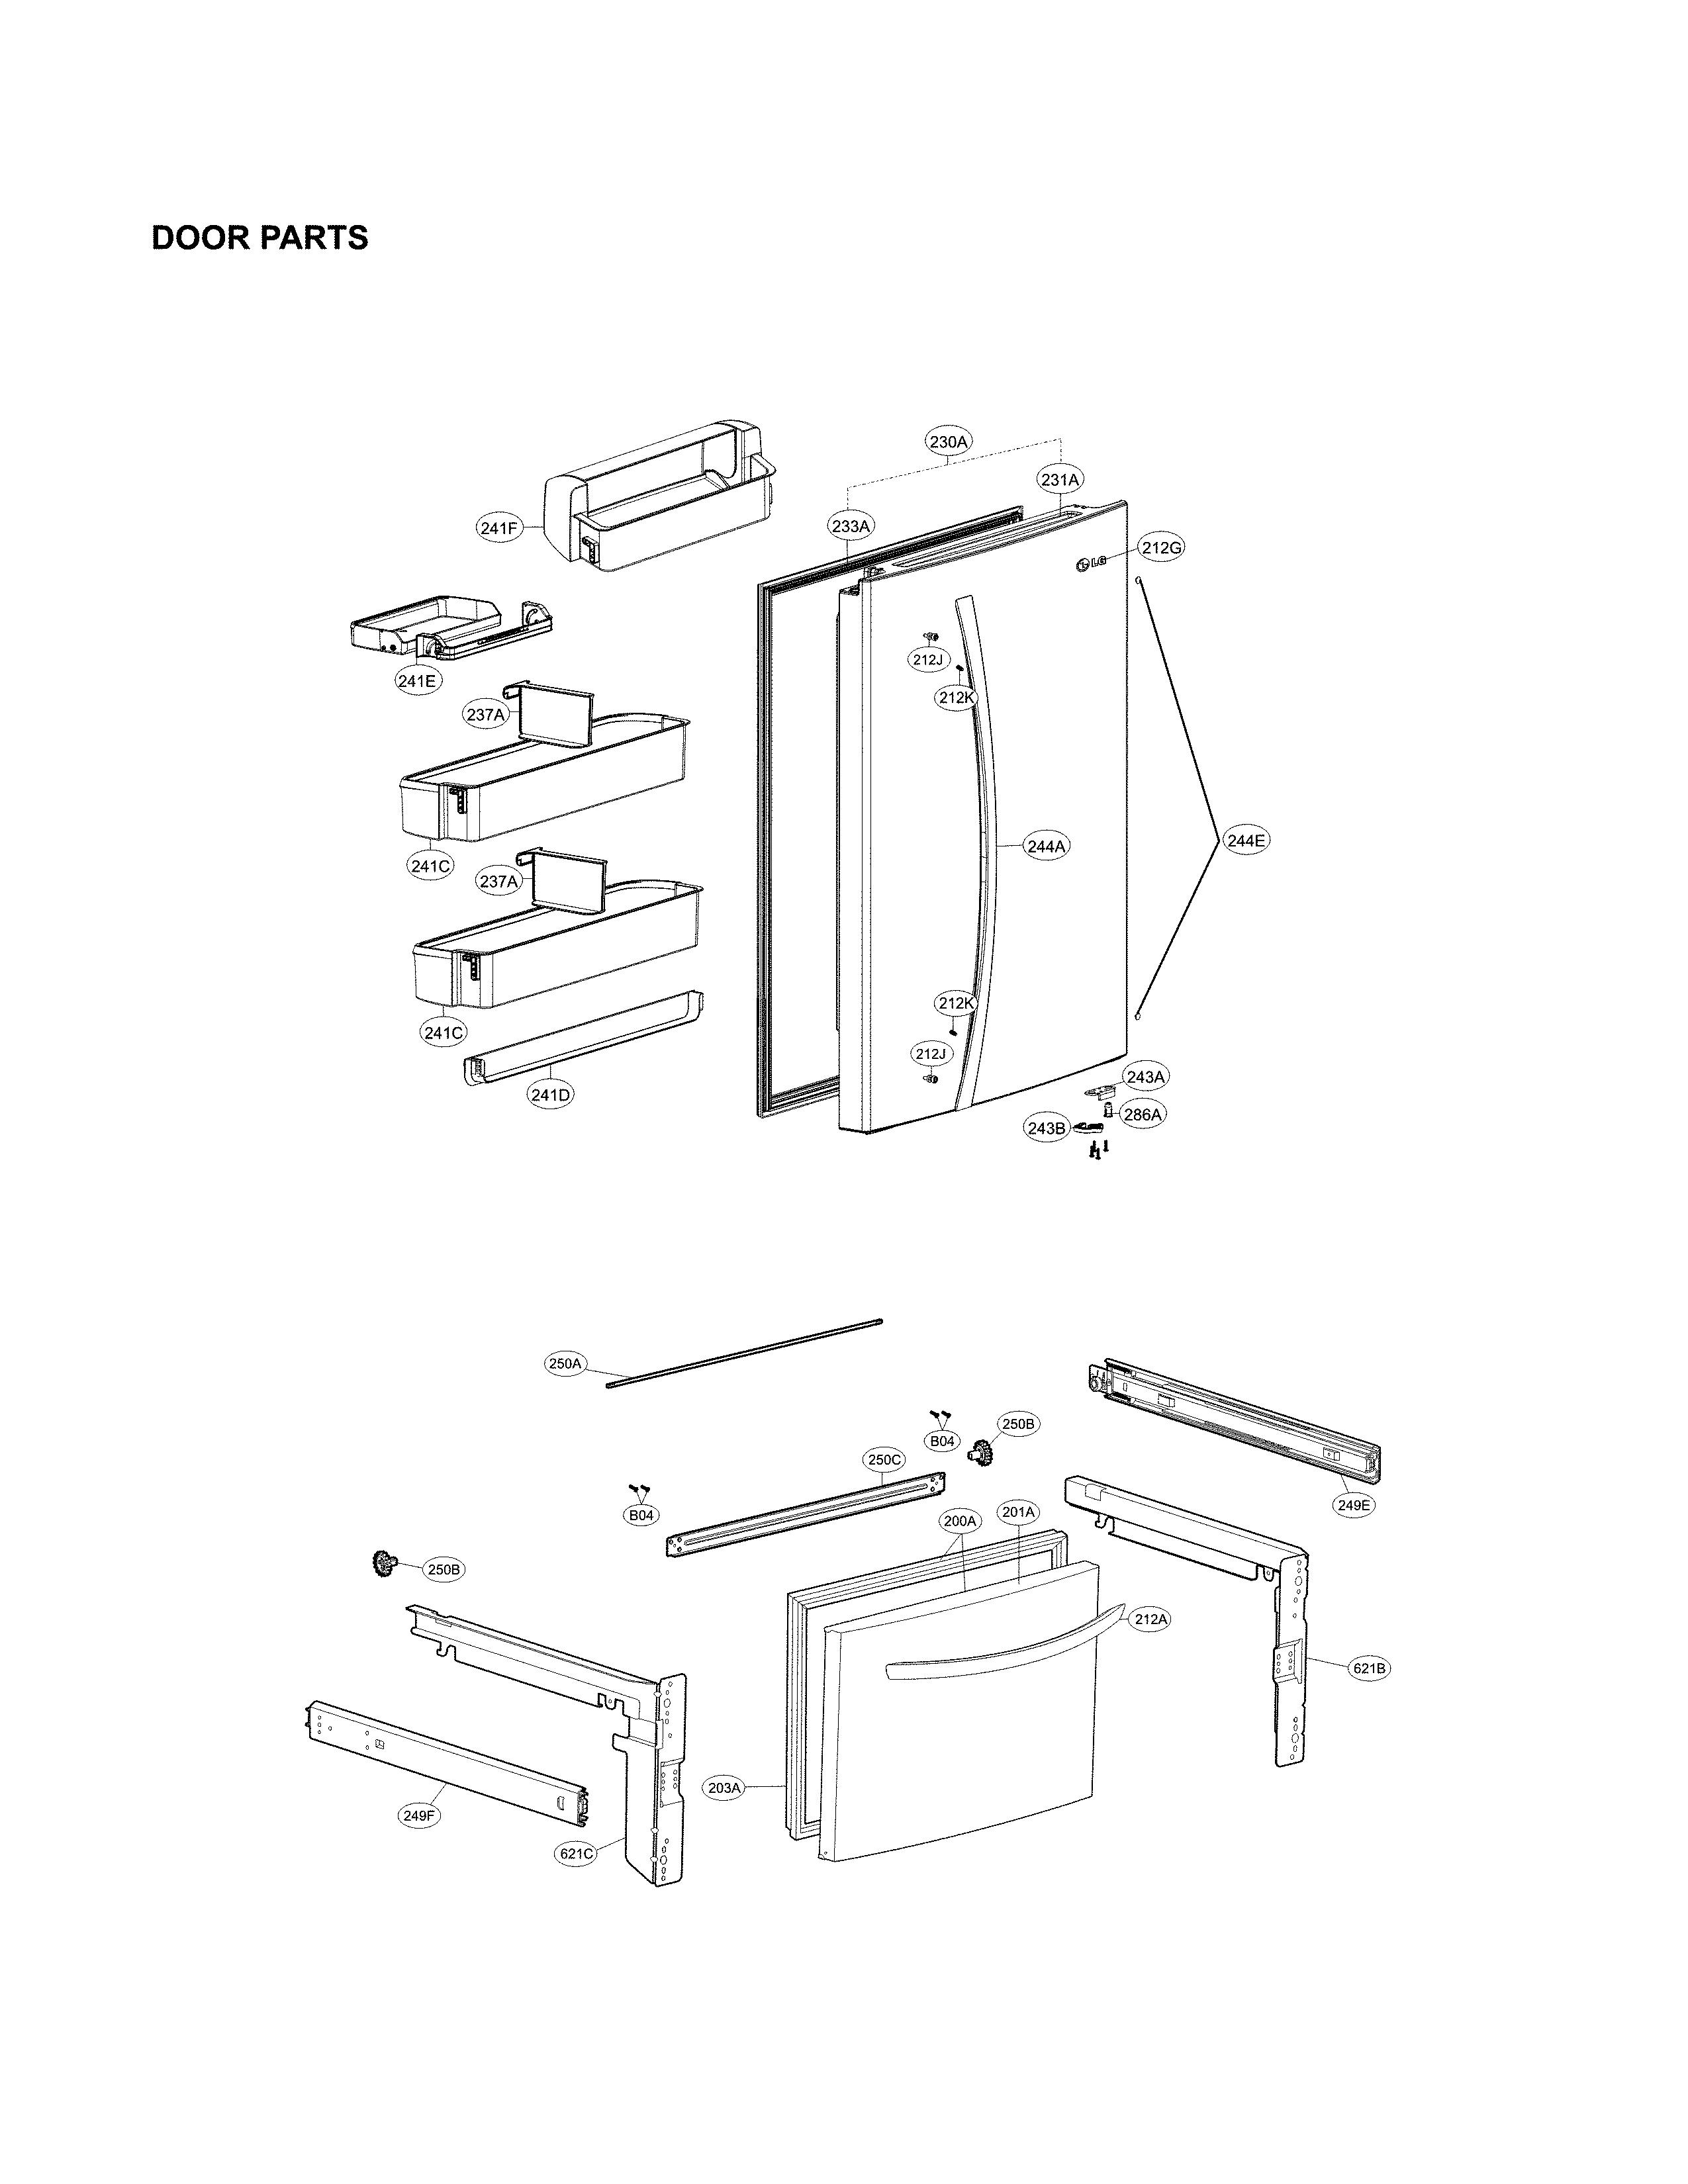 Lg model LDCS24223S/00 bottom-mount refrigerator genuine parts